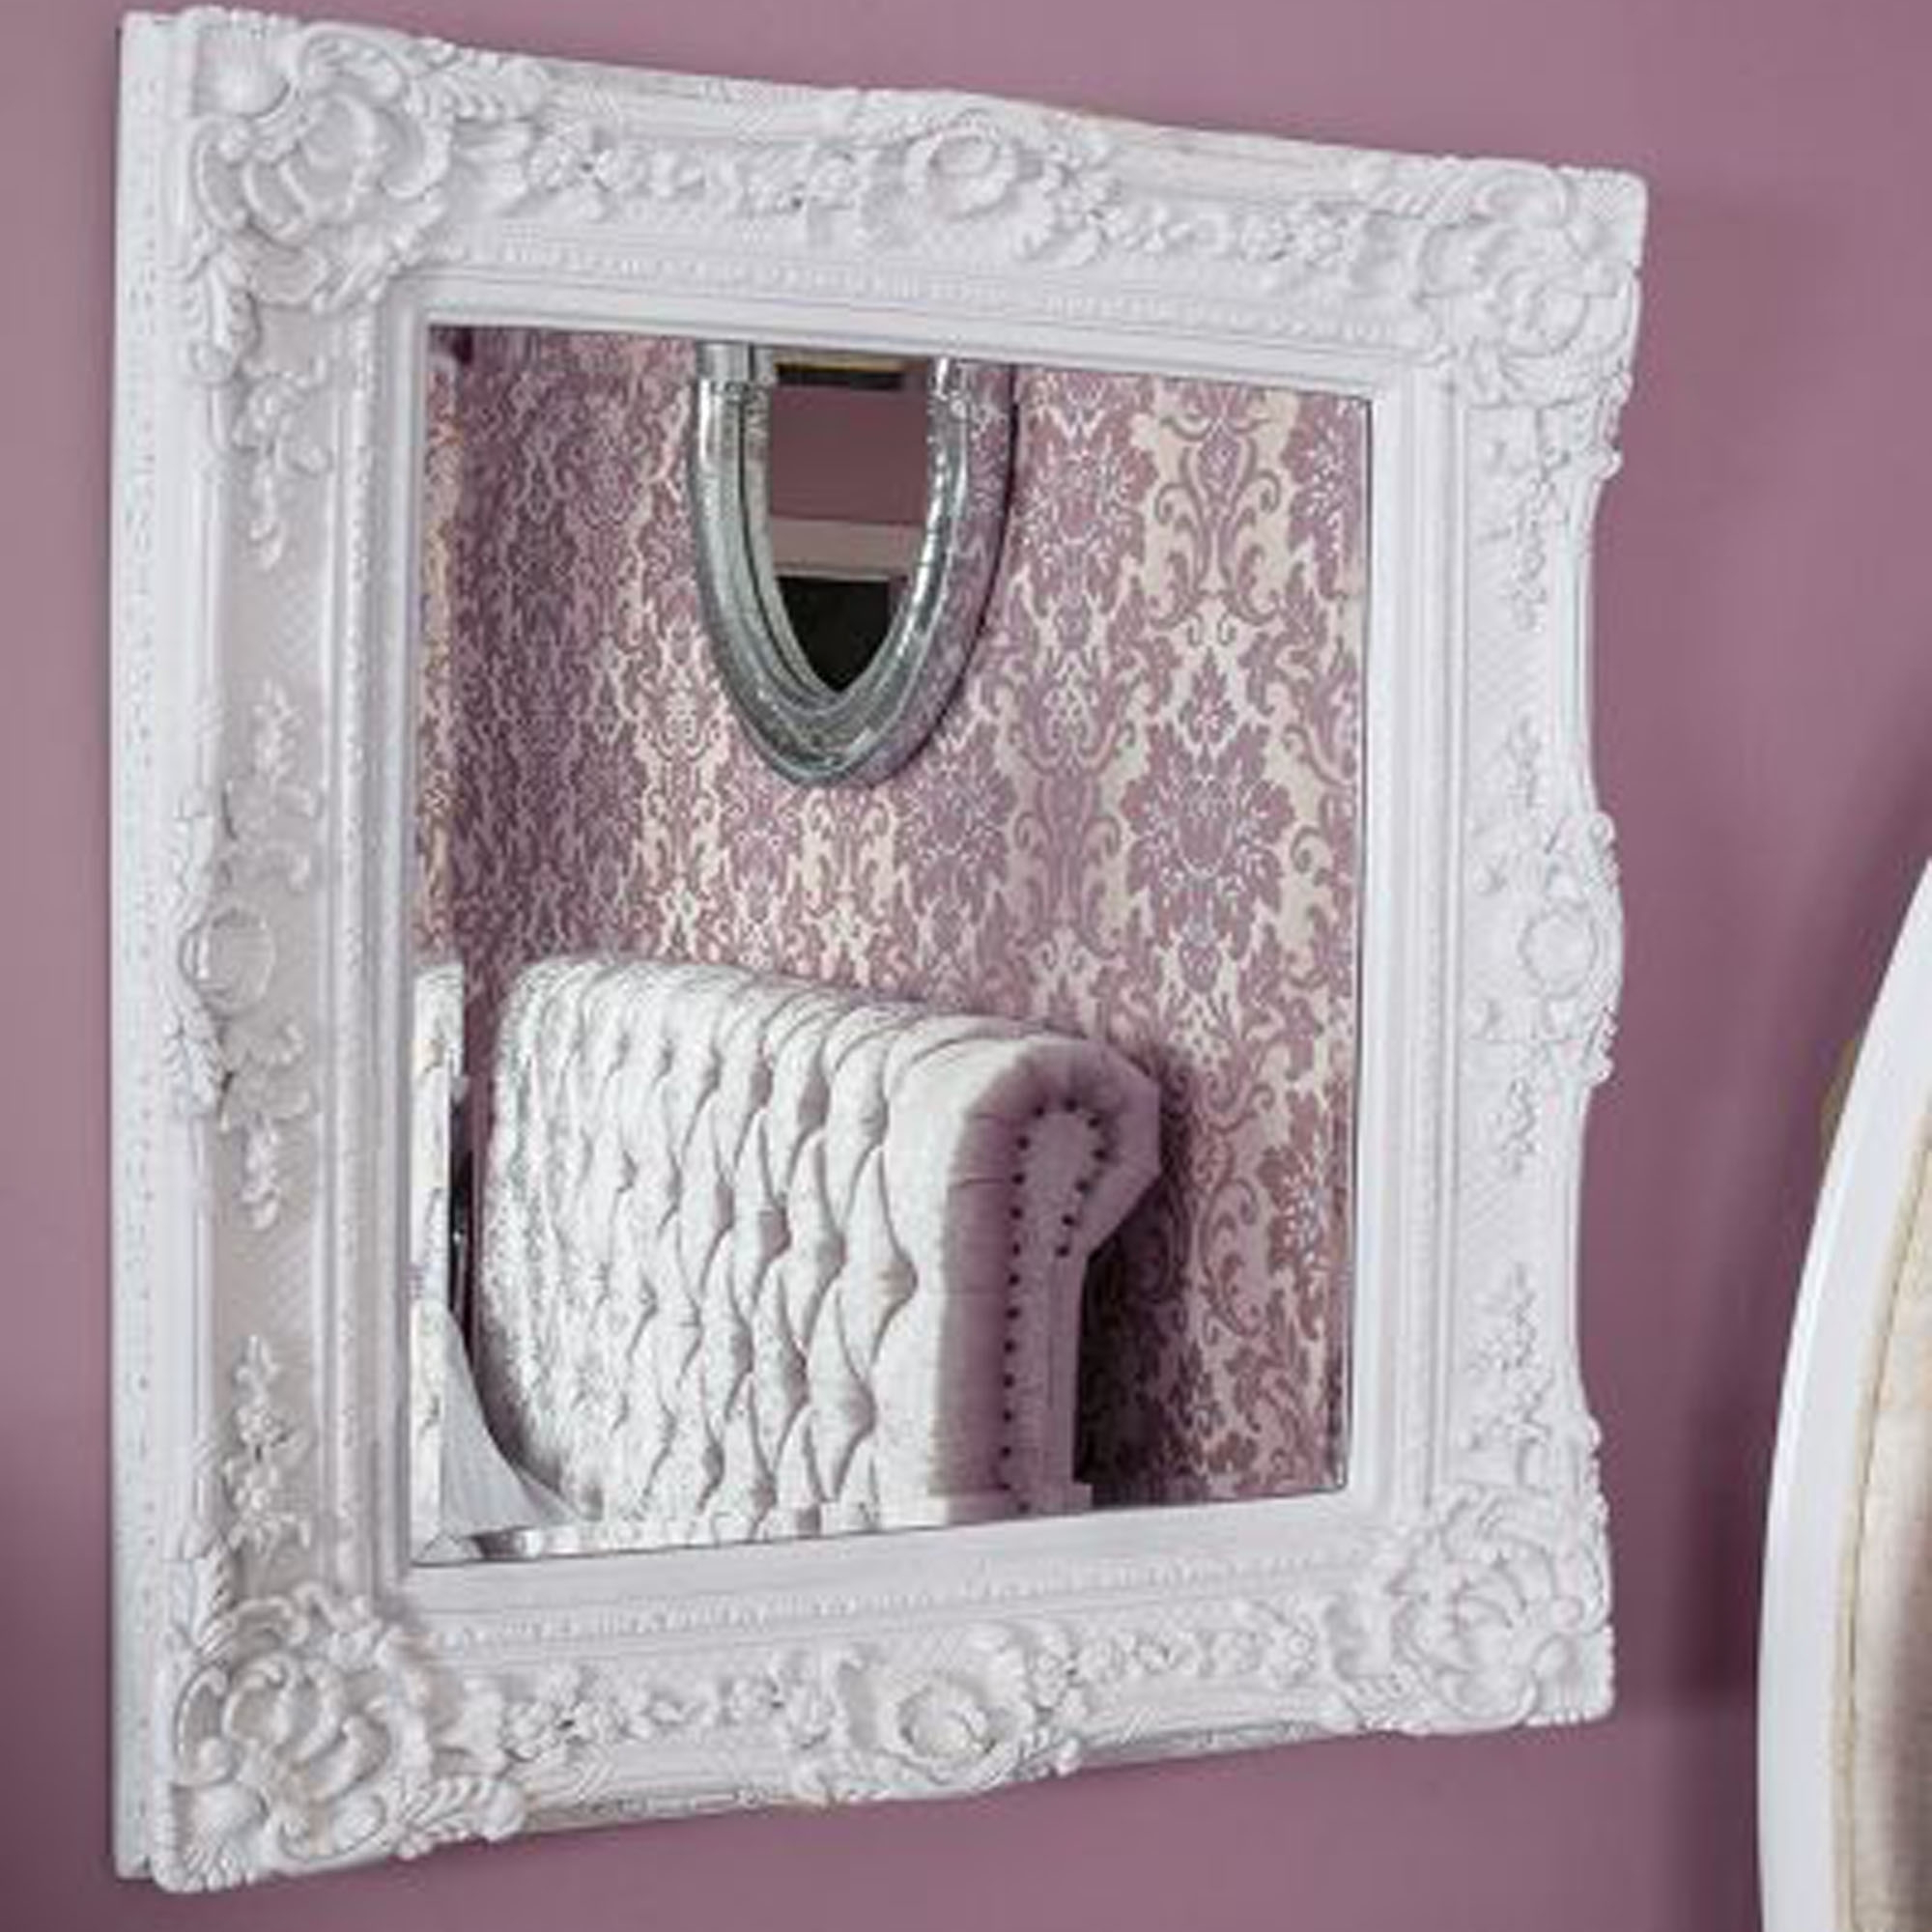 Caens White Decorative Mirror With Regard To Popular White Decorative Wall Mirrors (View 2 of 20)